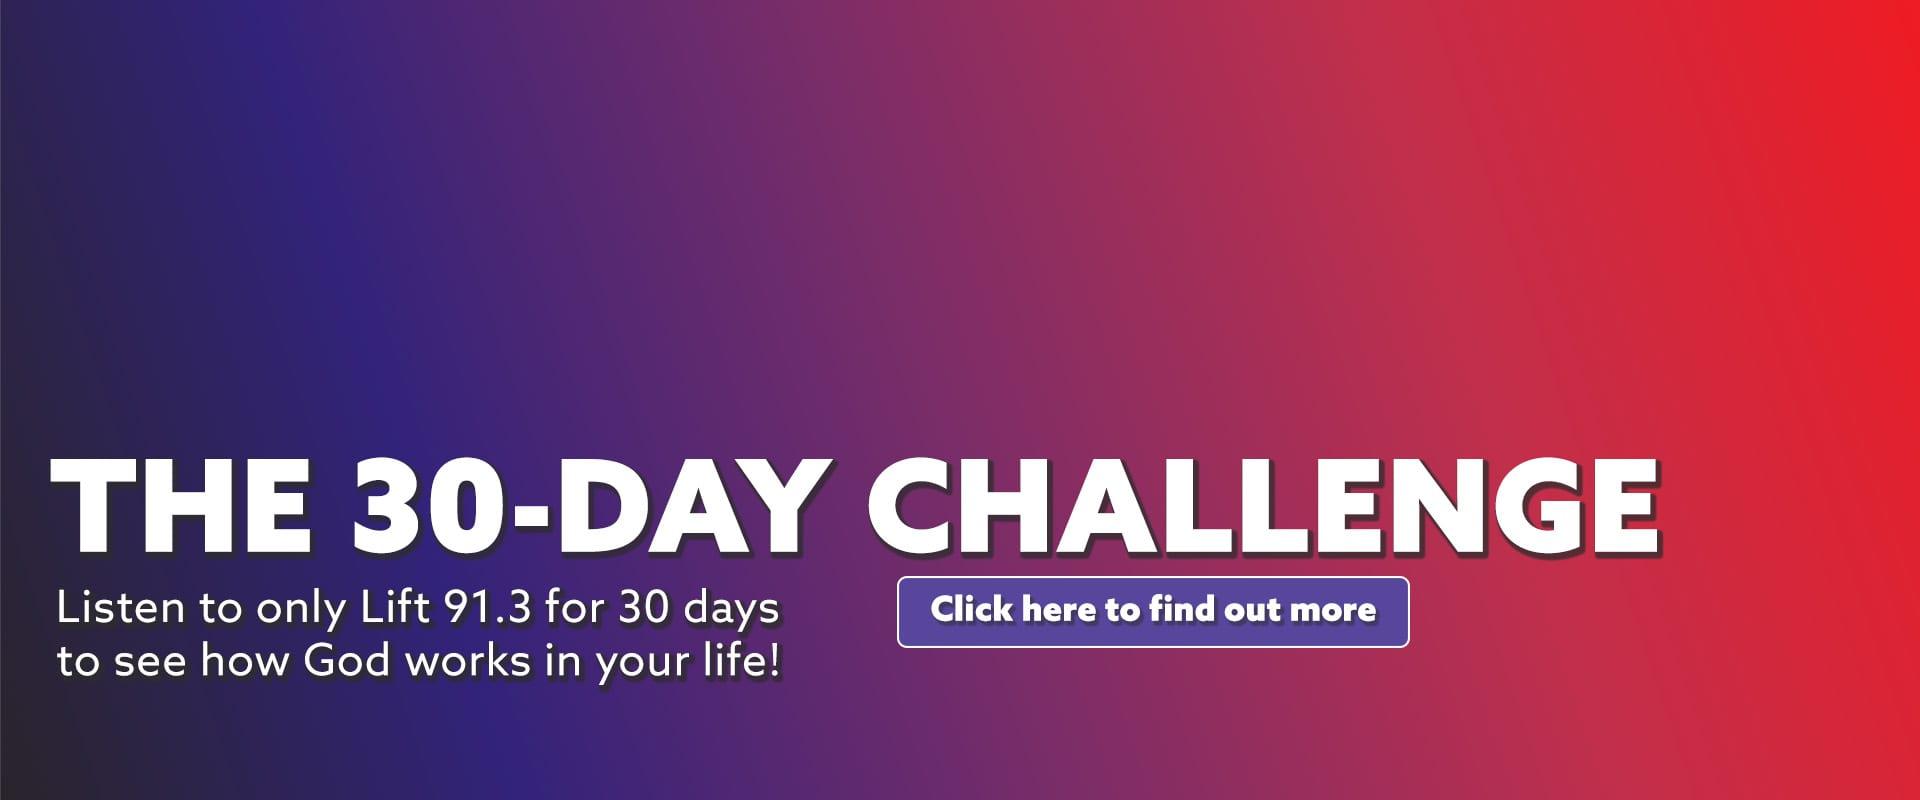 2020-30-Day-Challenge-Lift